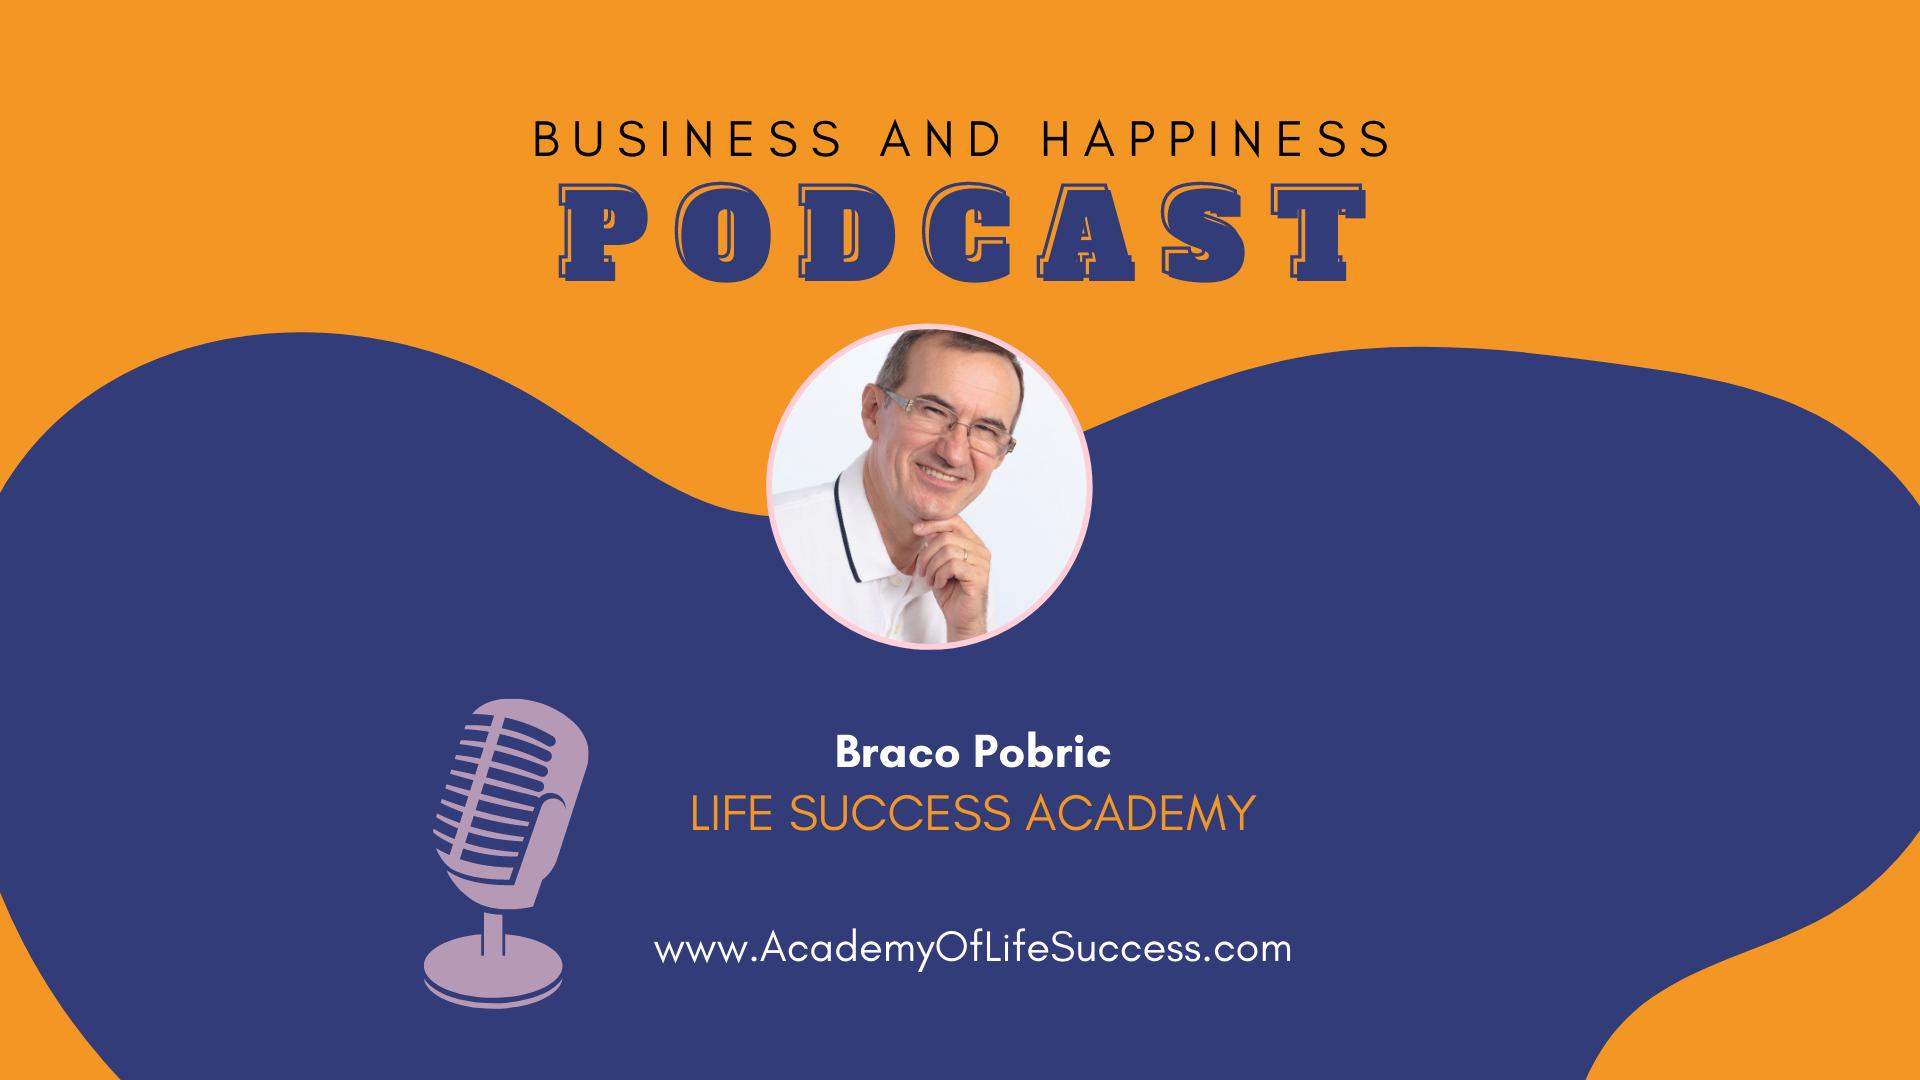 Life Success Academy Podcast